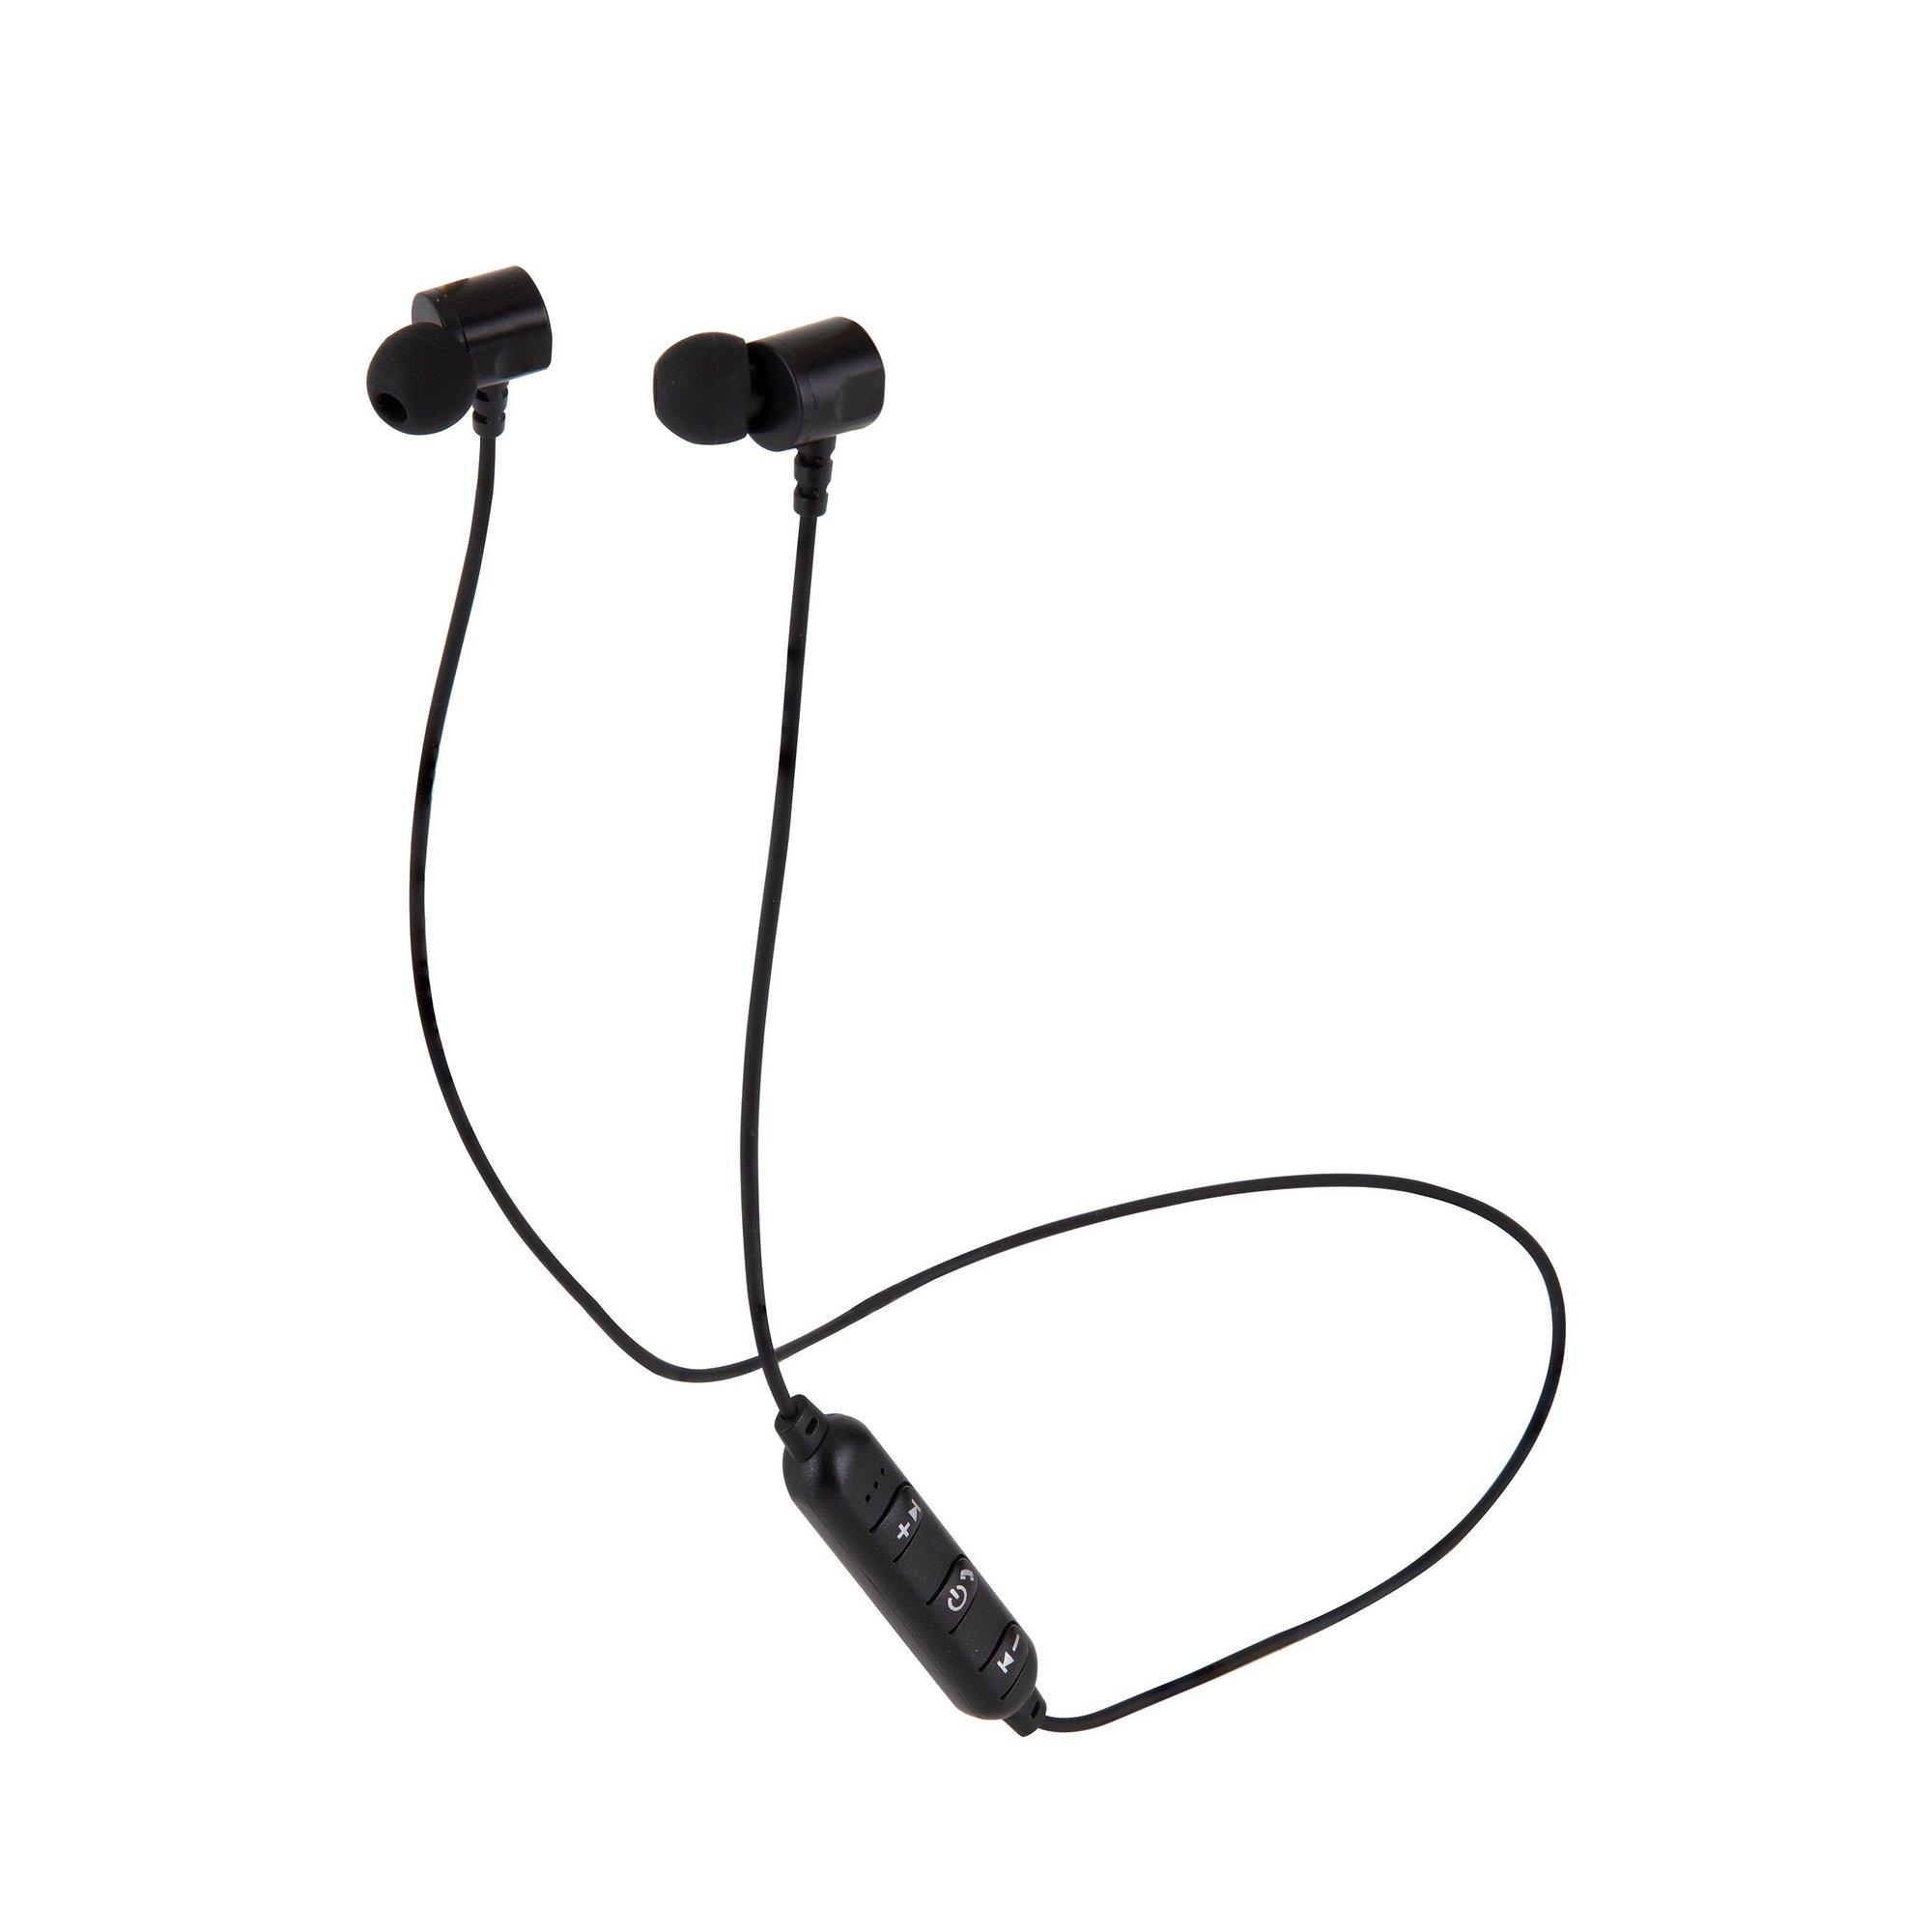 Image of Akai Dynmx3 Sport Bluetooth Earphones